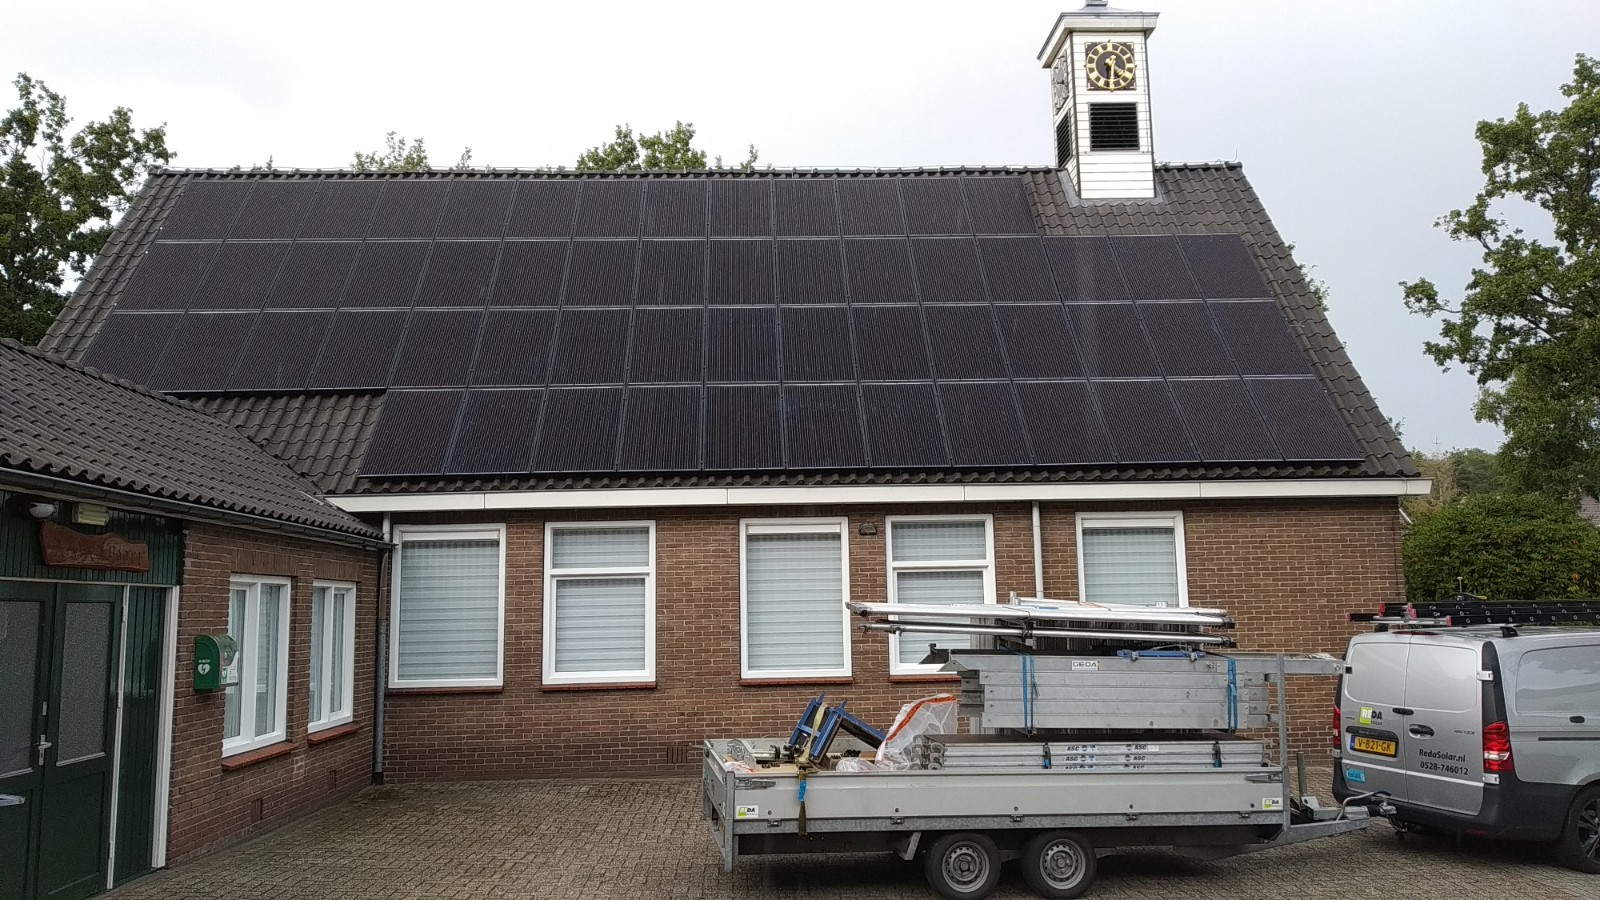 Solarwatt glas-glas zonnepanelen Tiendeveen